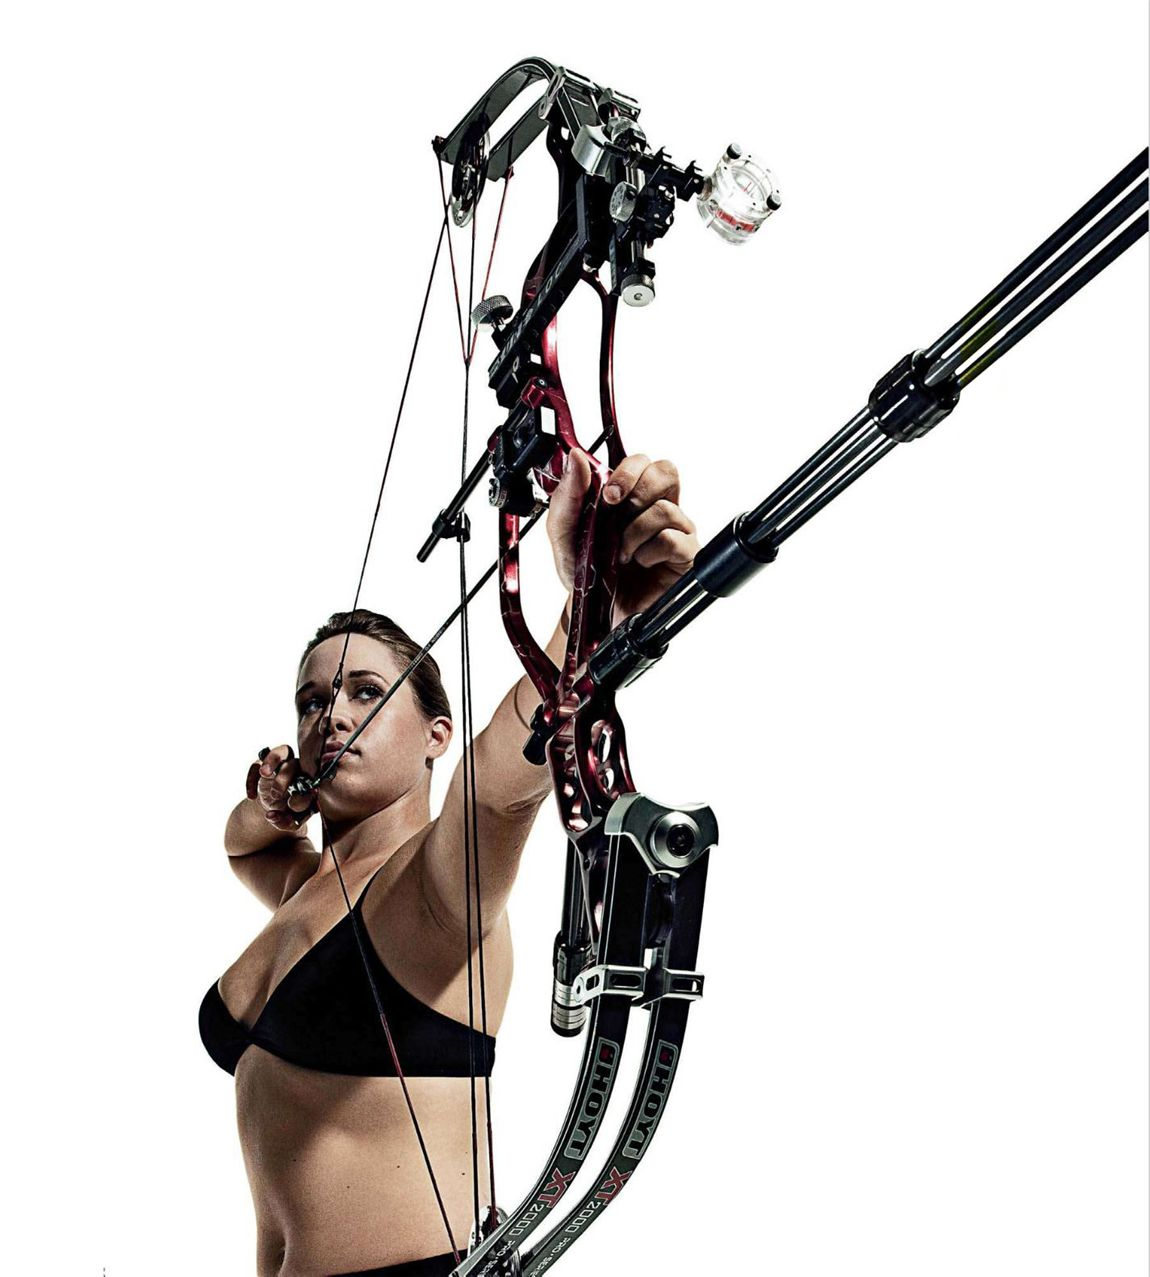 Эрика Аншульц / Erika Anschutz - ESPN Magazine Body Issue 18 october 2010